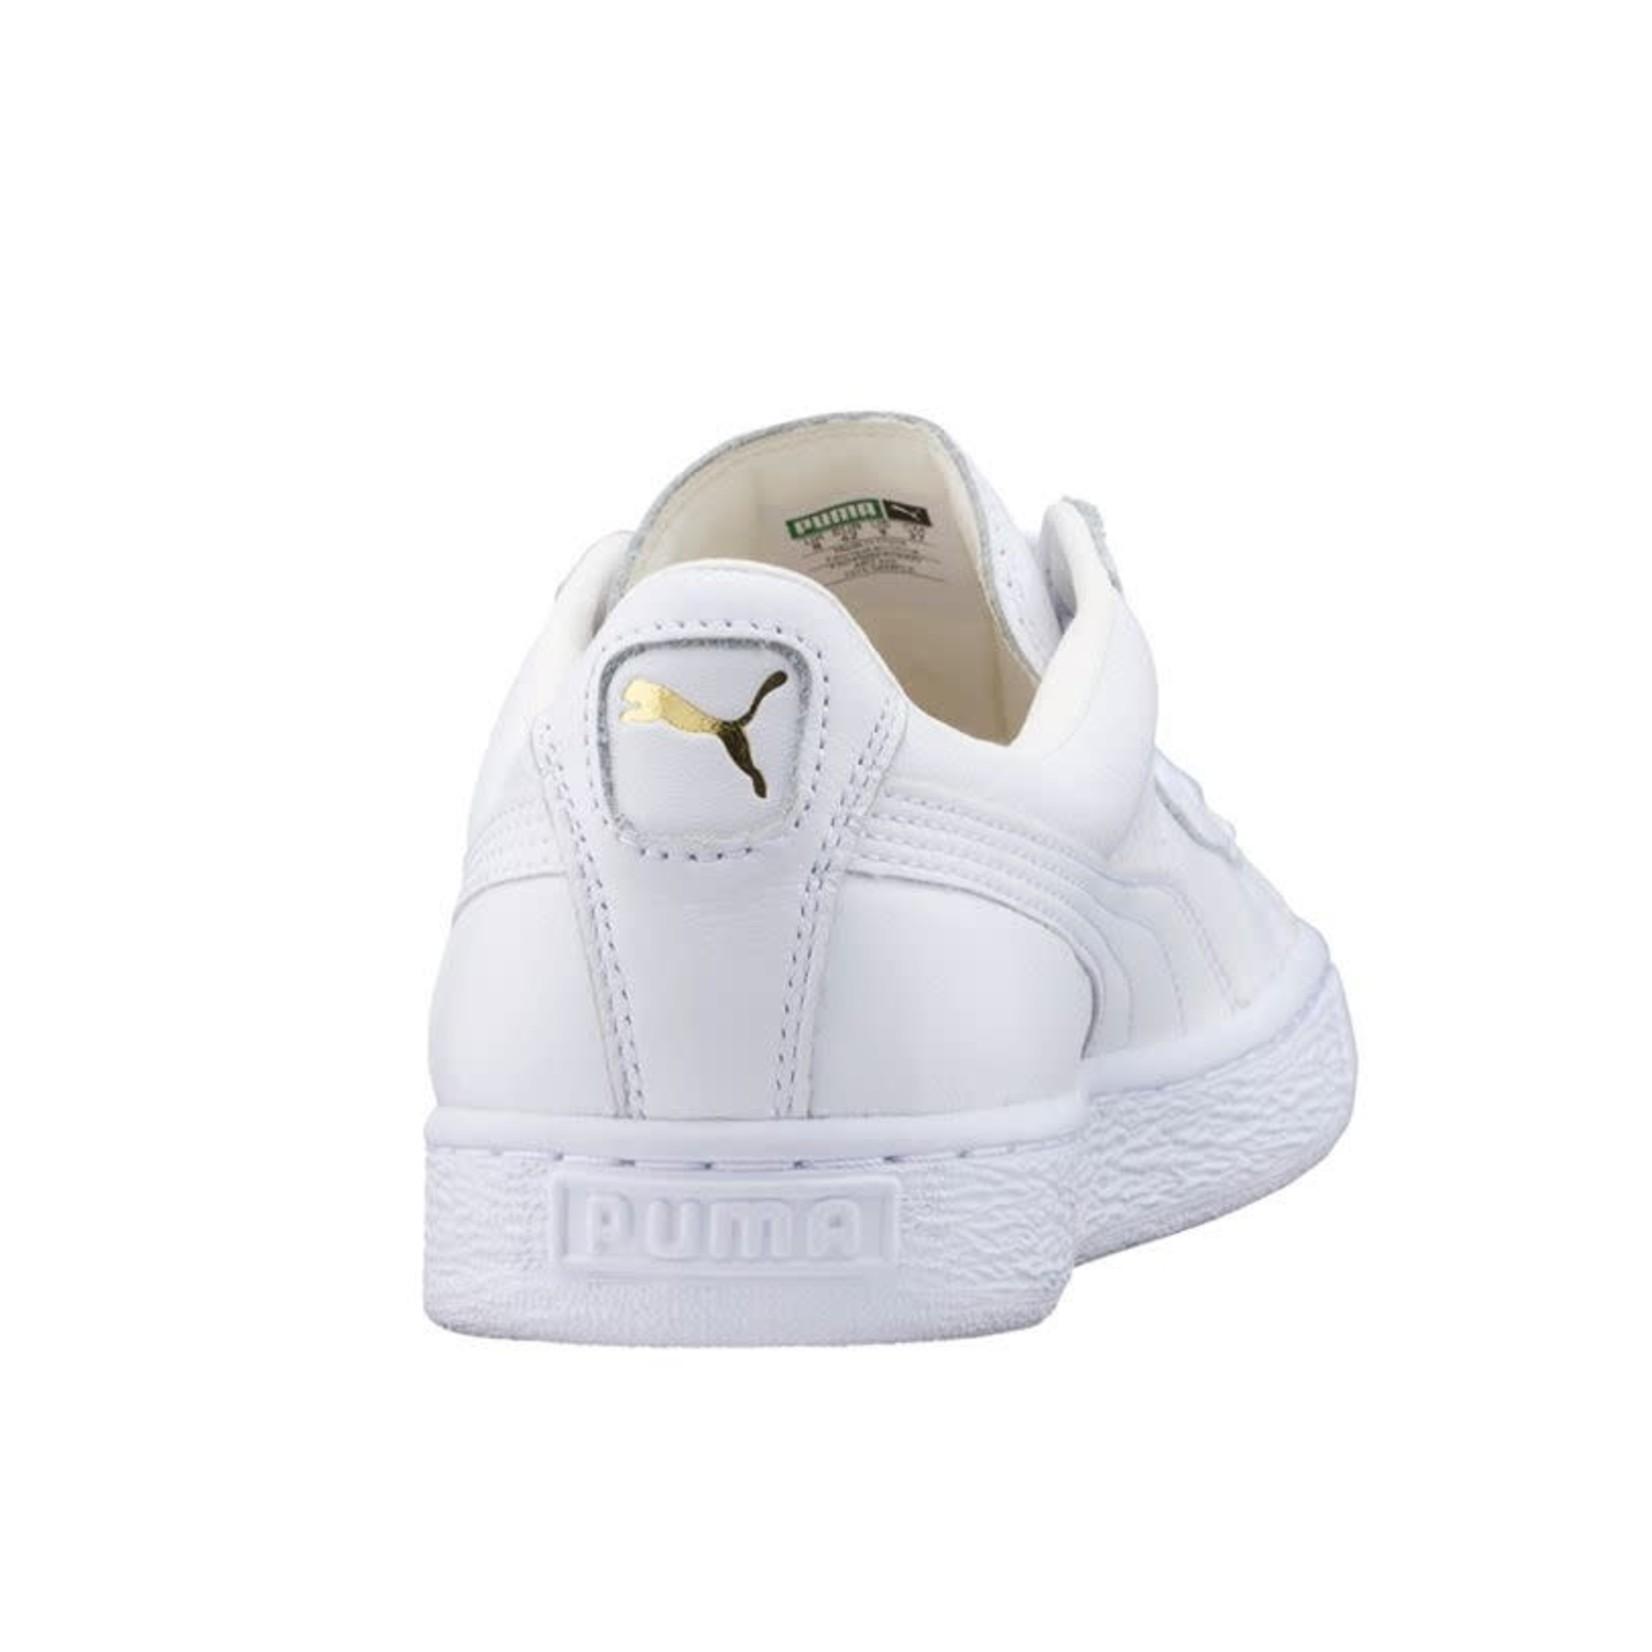 PUMA Puma Footwear : Heritage Basket Classic Shoes